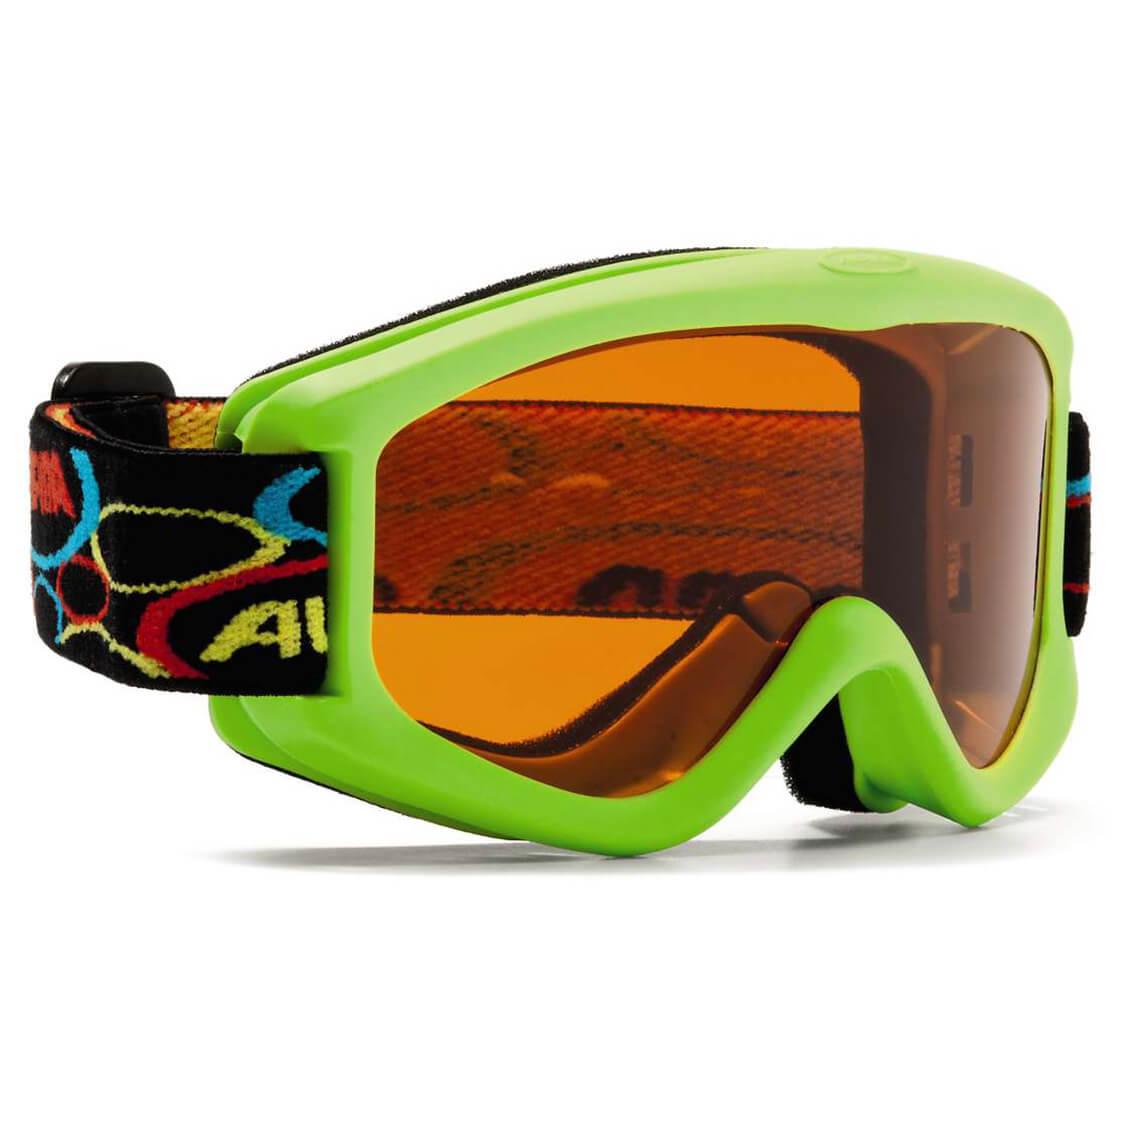 Alpina Carvy Ski Goggles Kids Buy Online Alpinetrekcouk - Alpina goggles